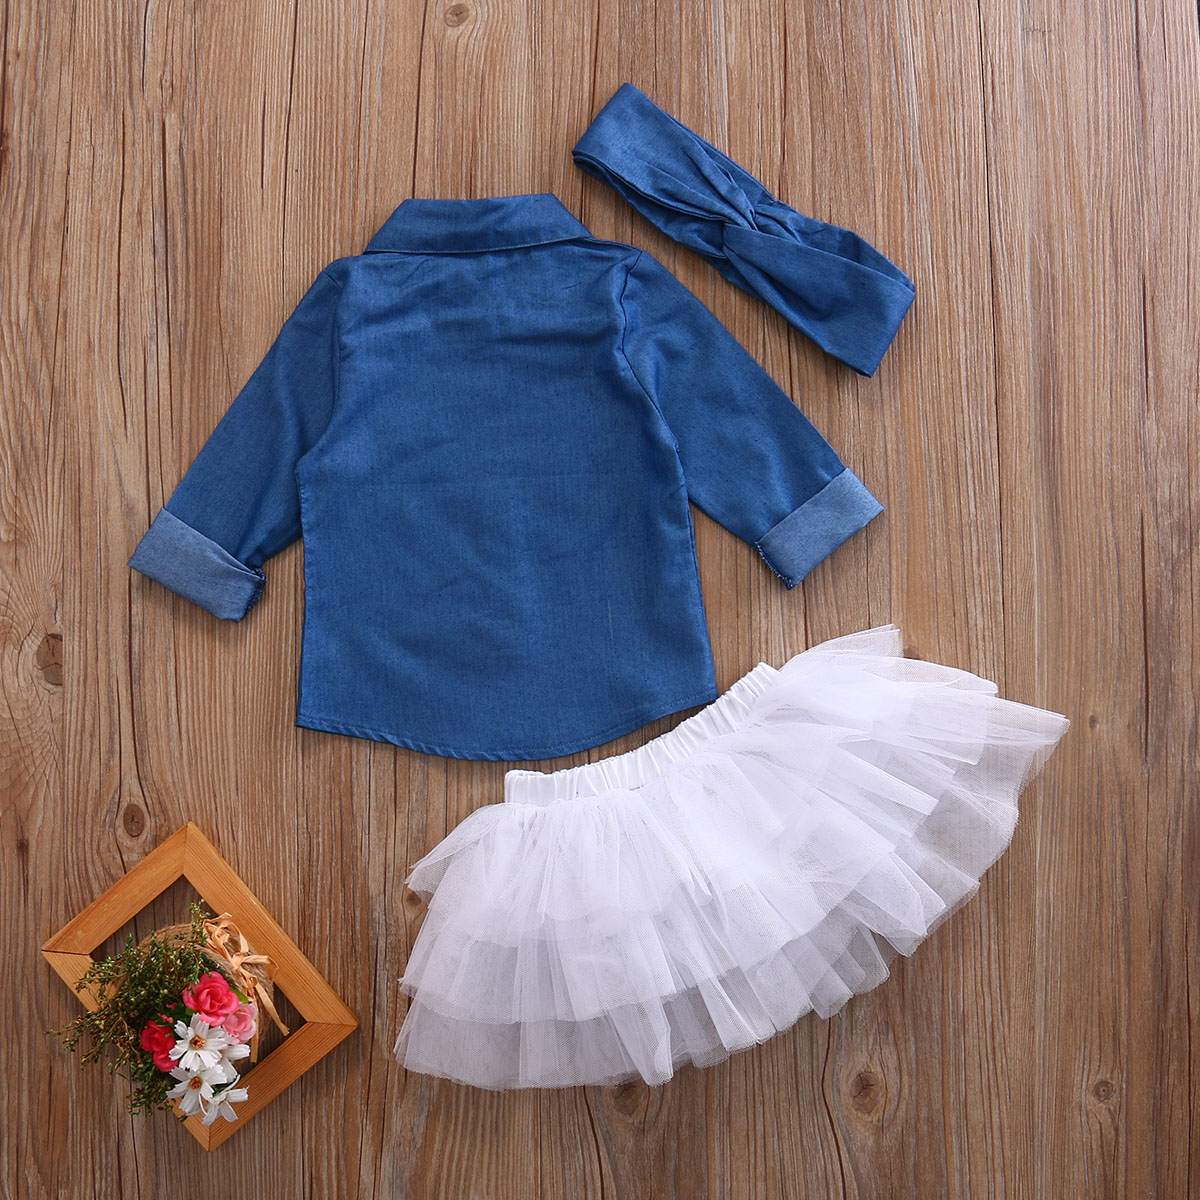 3PCS-Toddler-Kids-Baby-Girl-Clothes-Set-Denim-Tops-T-shirt-Tutu-Skirt-Headband-Outfits-Summer-Cowboy-Suit-Children-Set-0-5Y-5